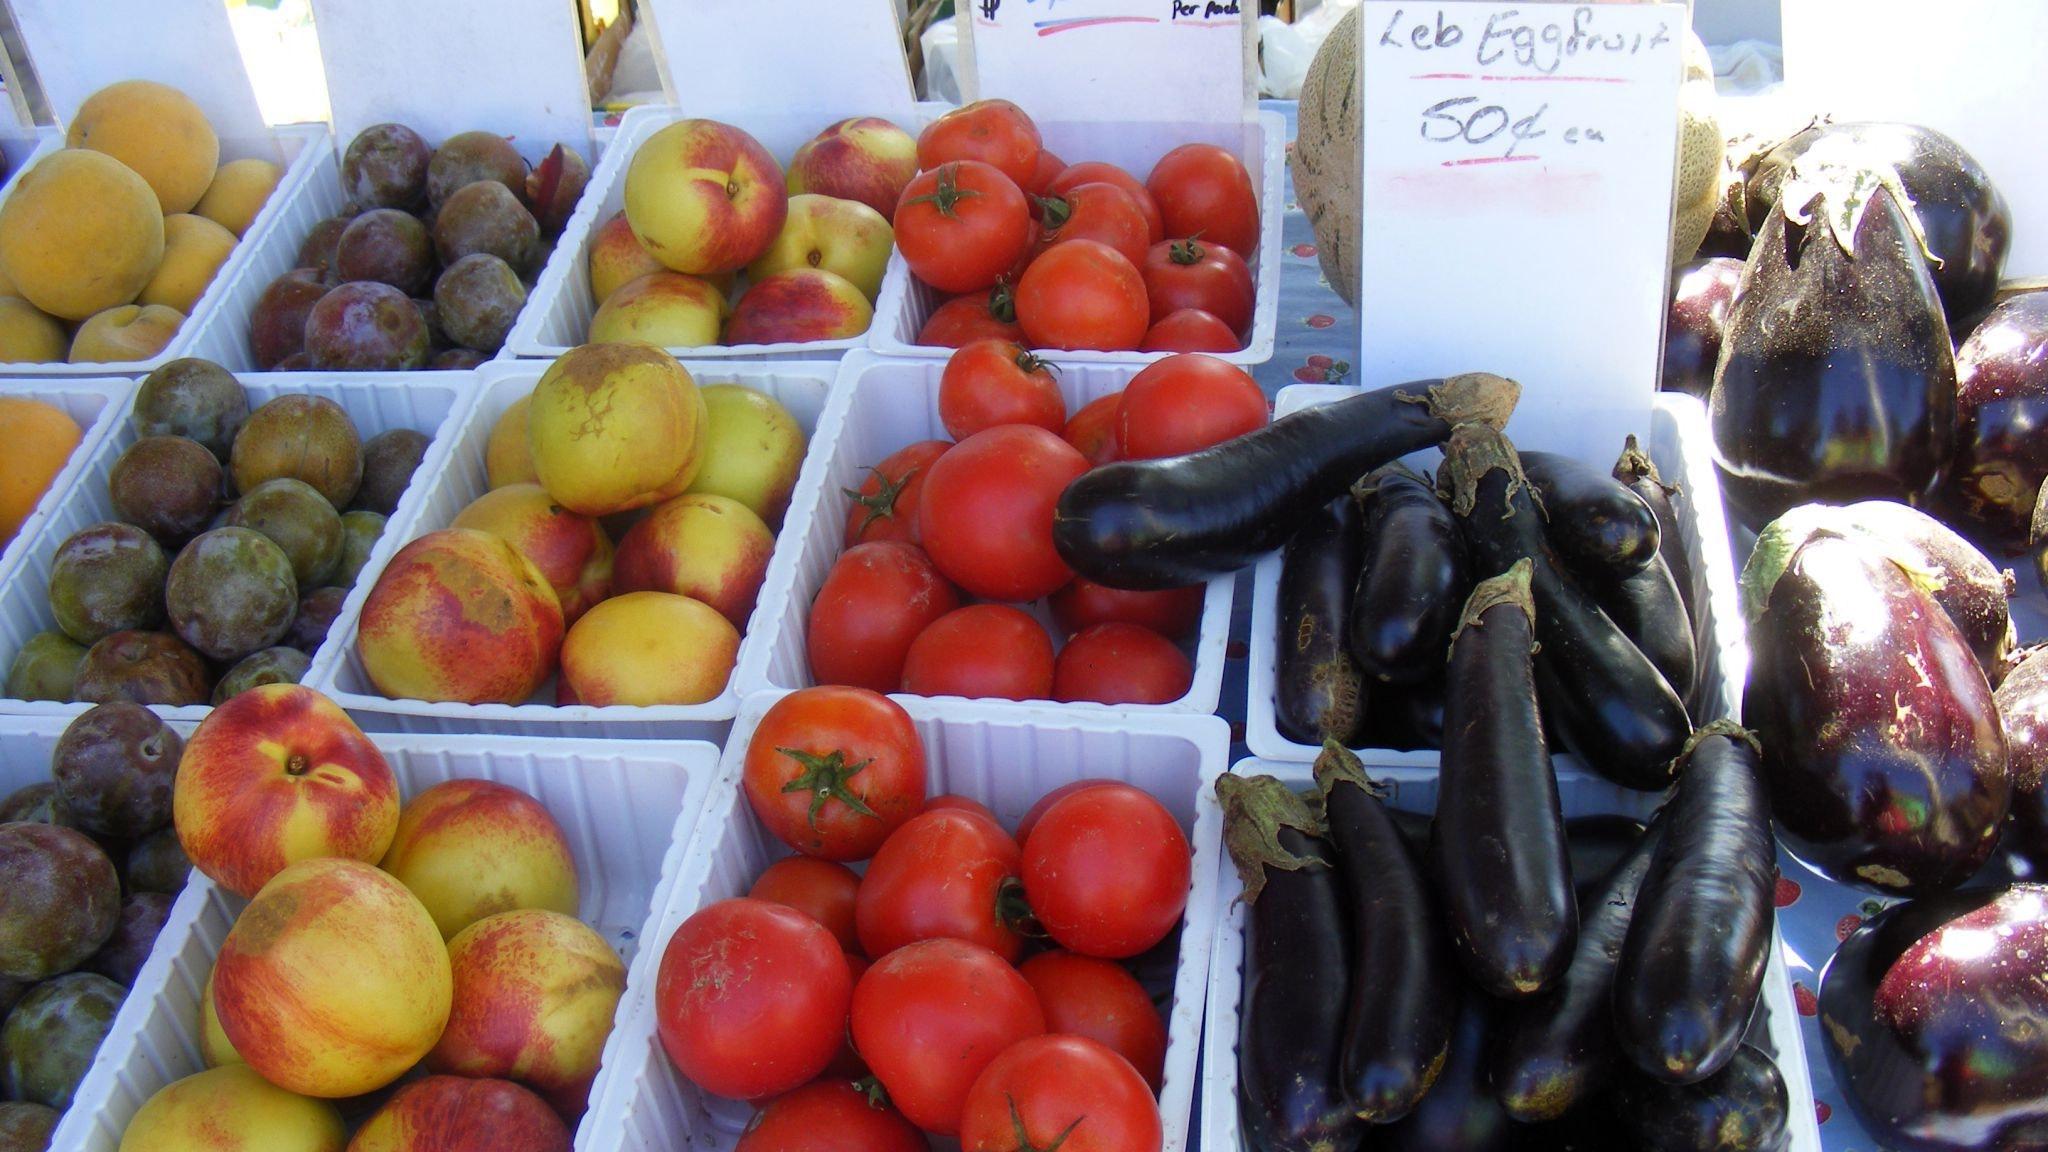 Rutherglen Farmers Market Fruit and Vegetables